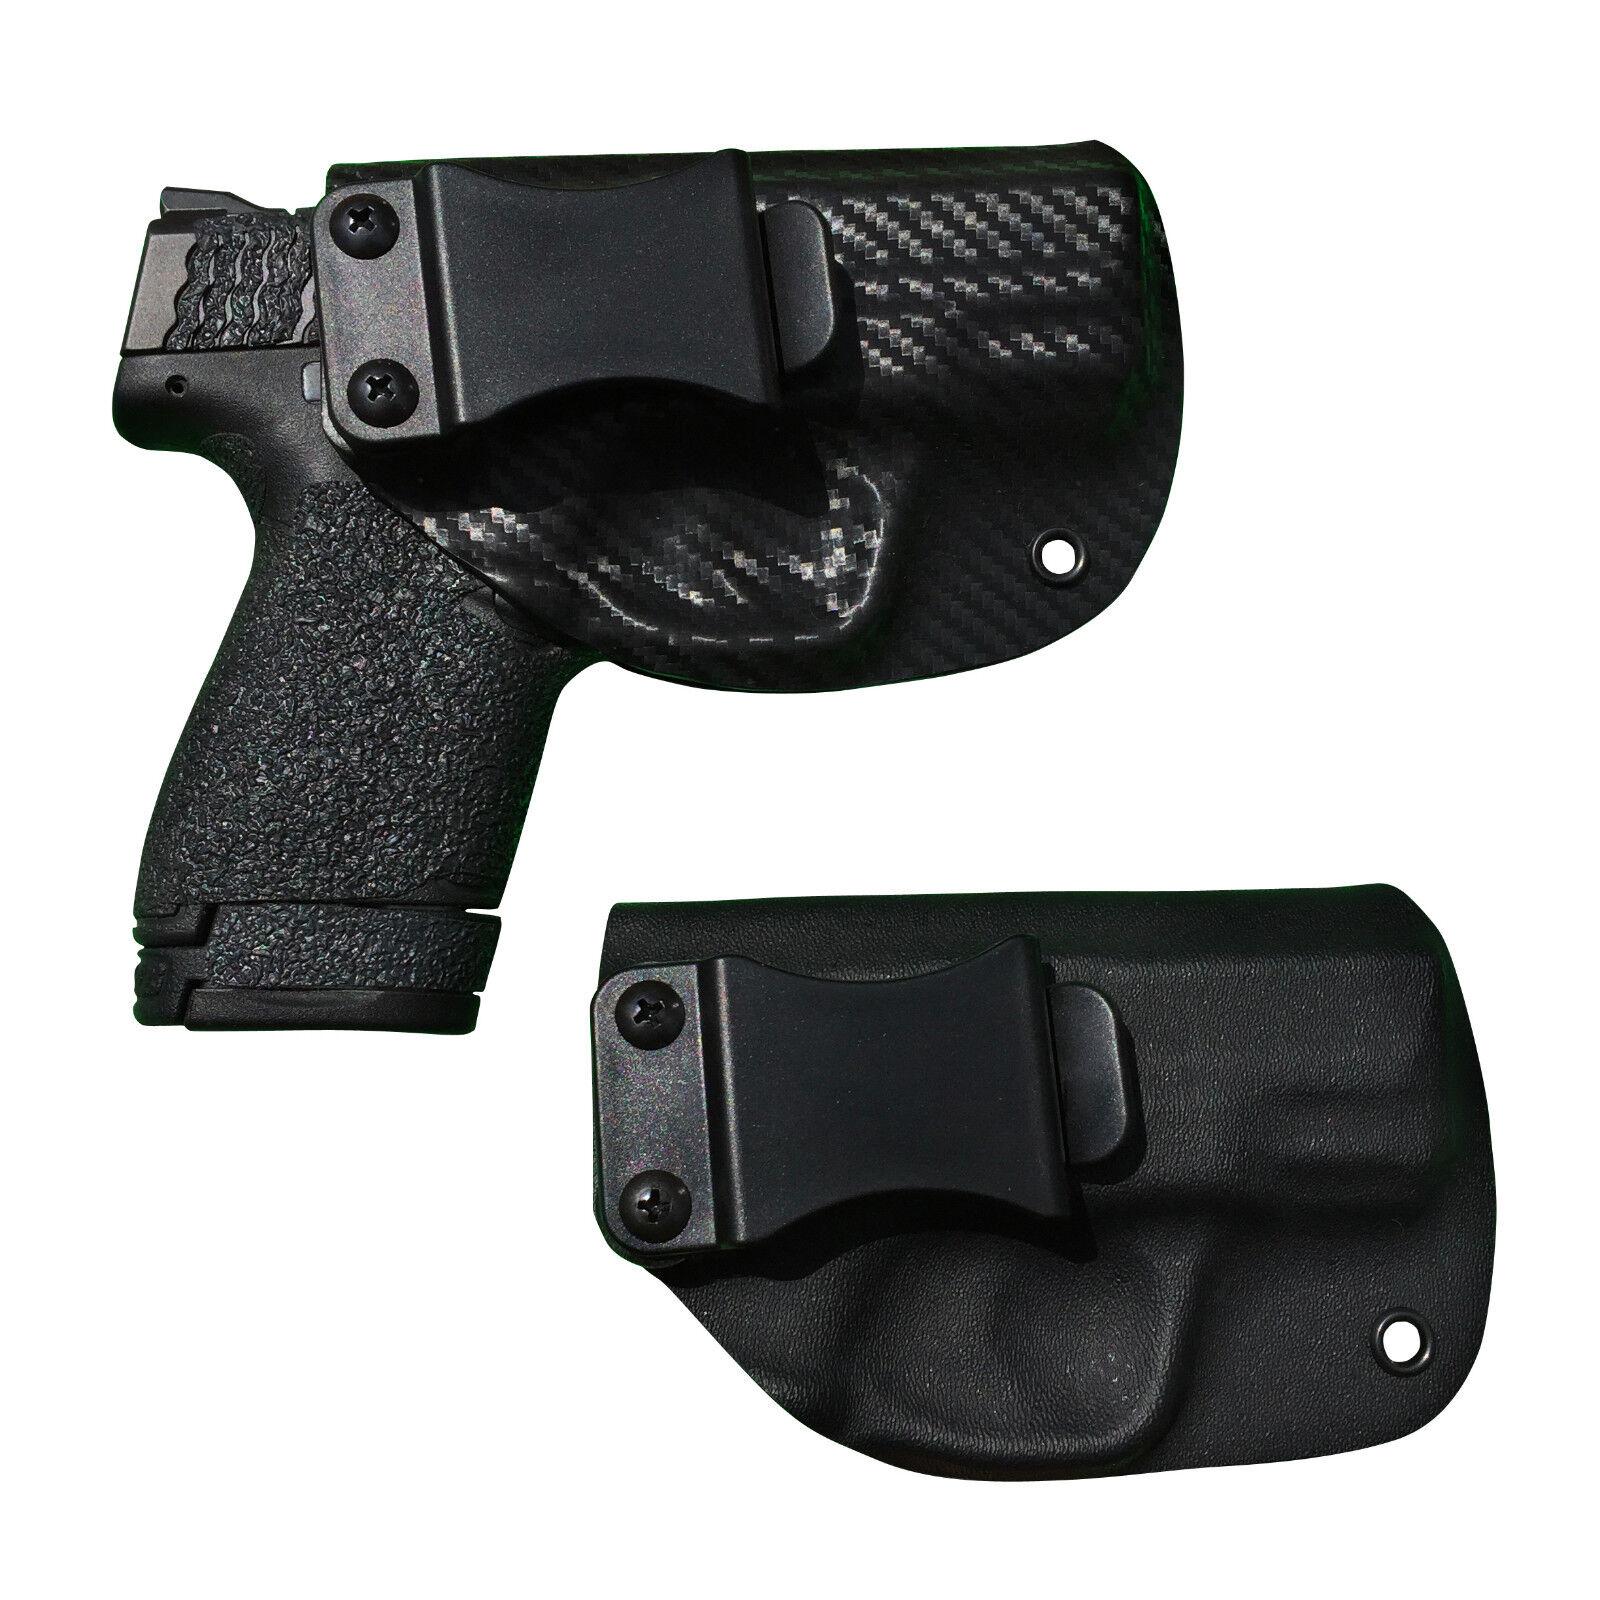 Nylon Gun holster Fits Glock 42 With Laser